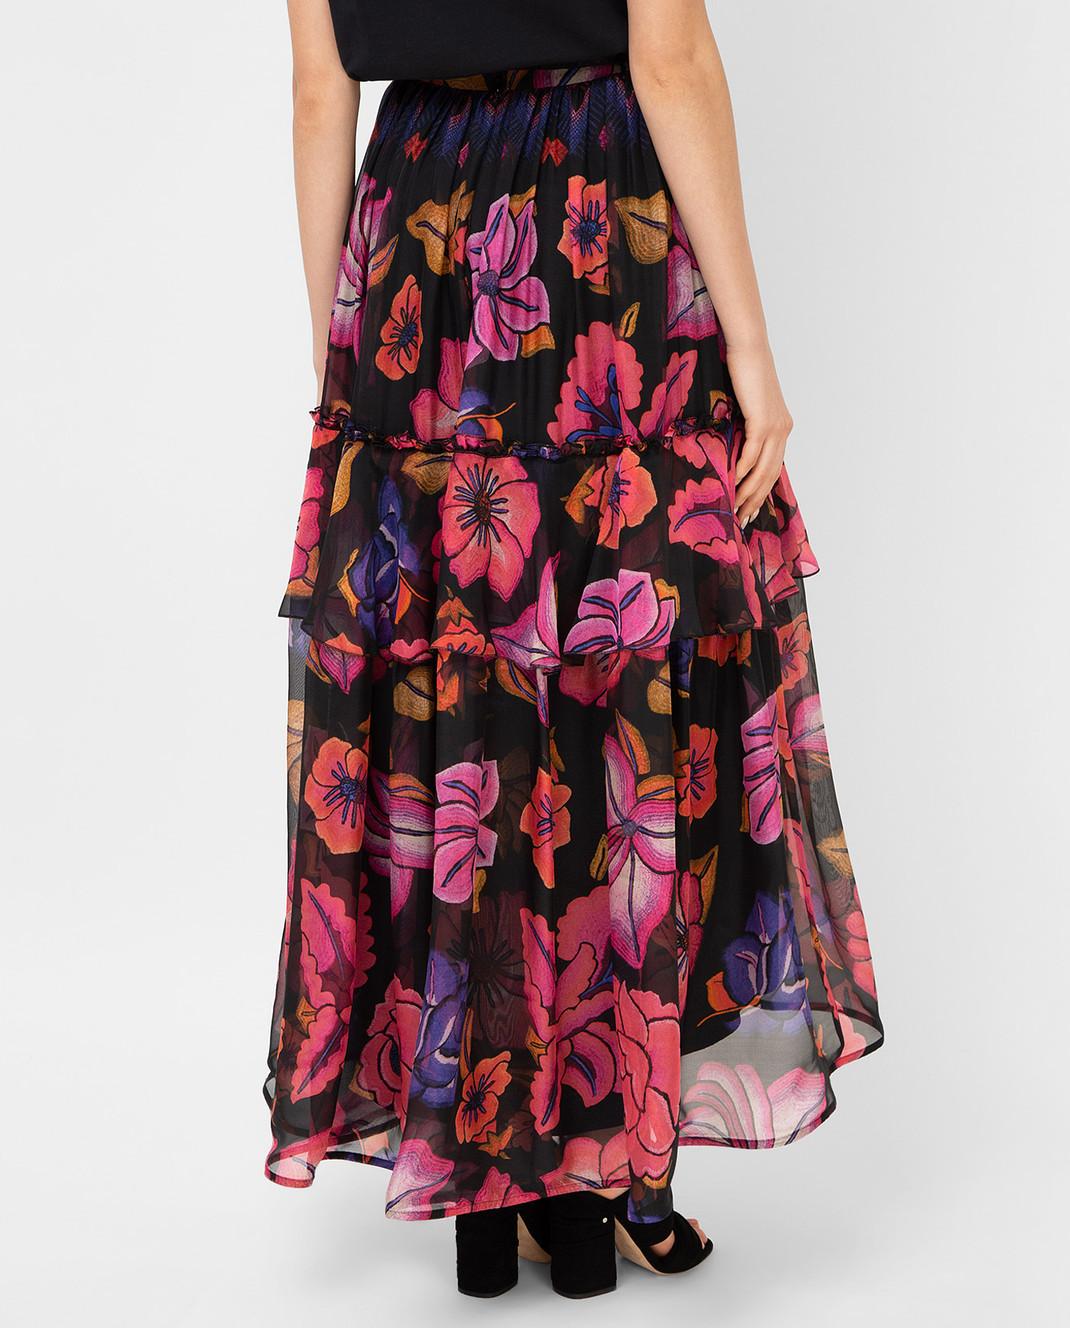 Alberta Ferretti Черная юбка из шелка A0122 изображение 4